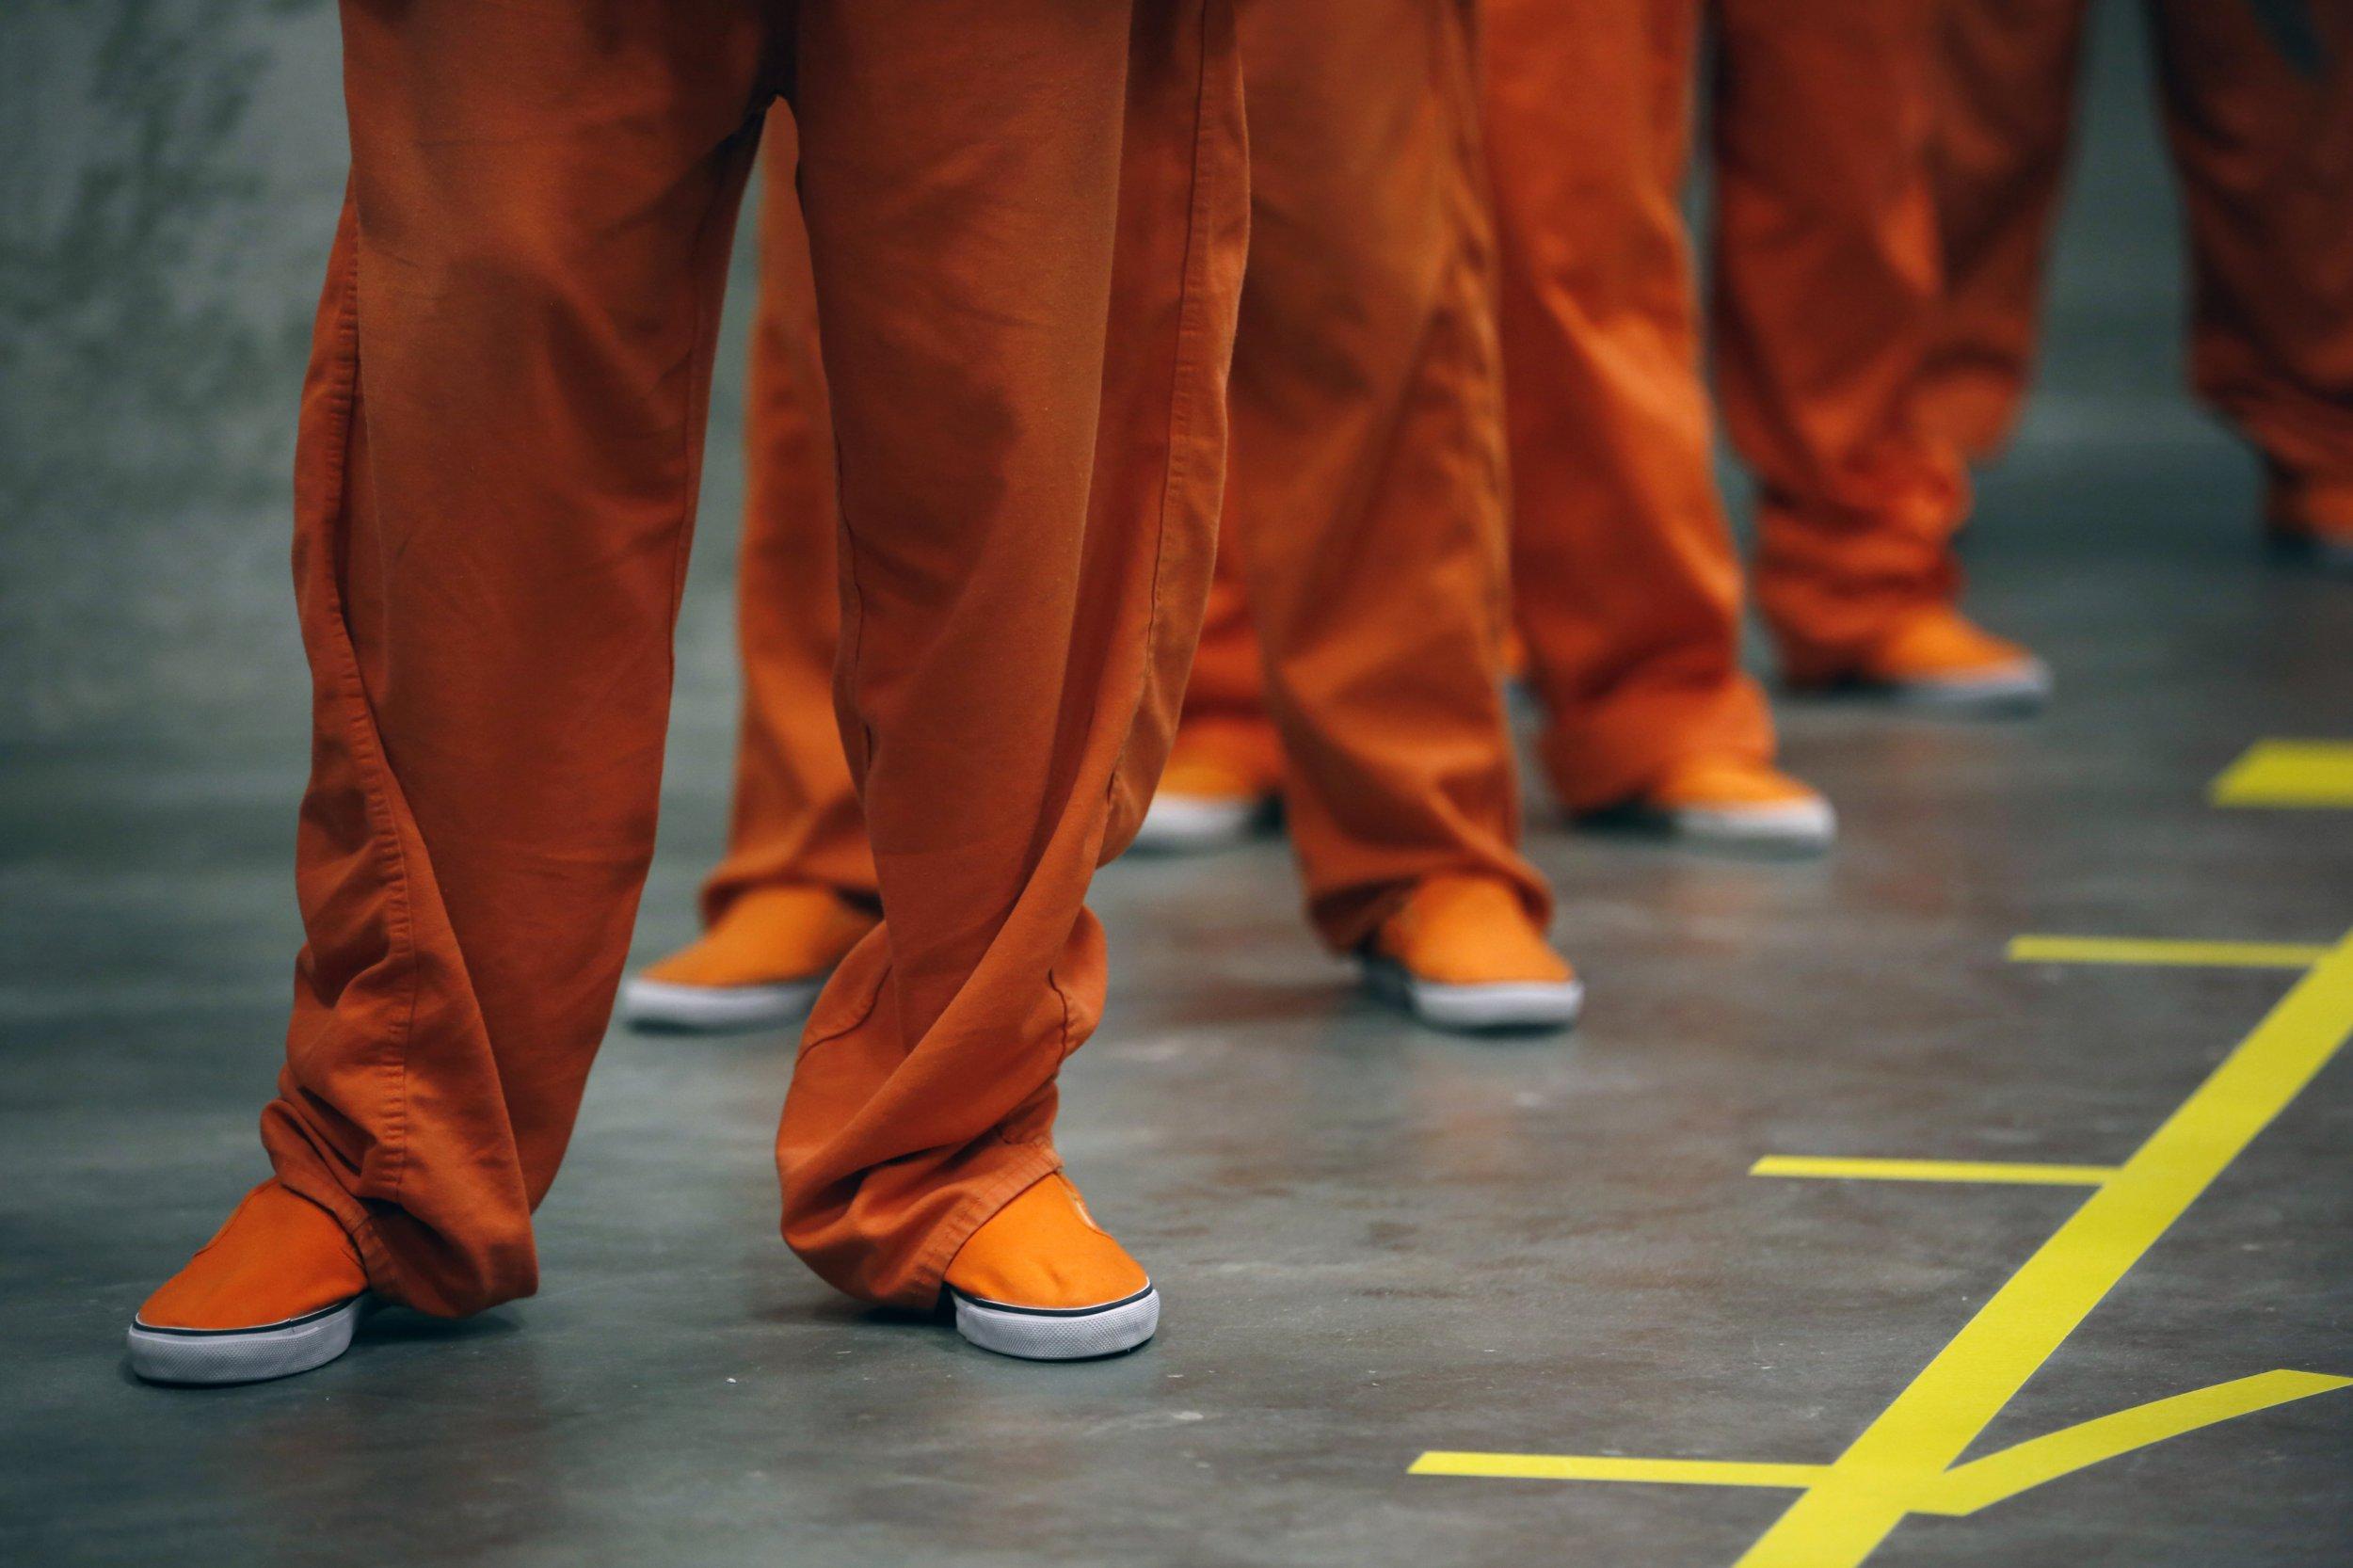 01_25_prisoners_parole_01